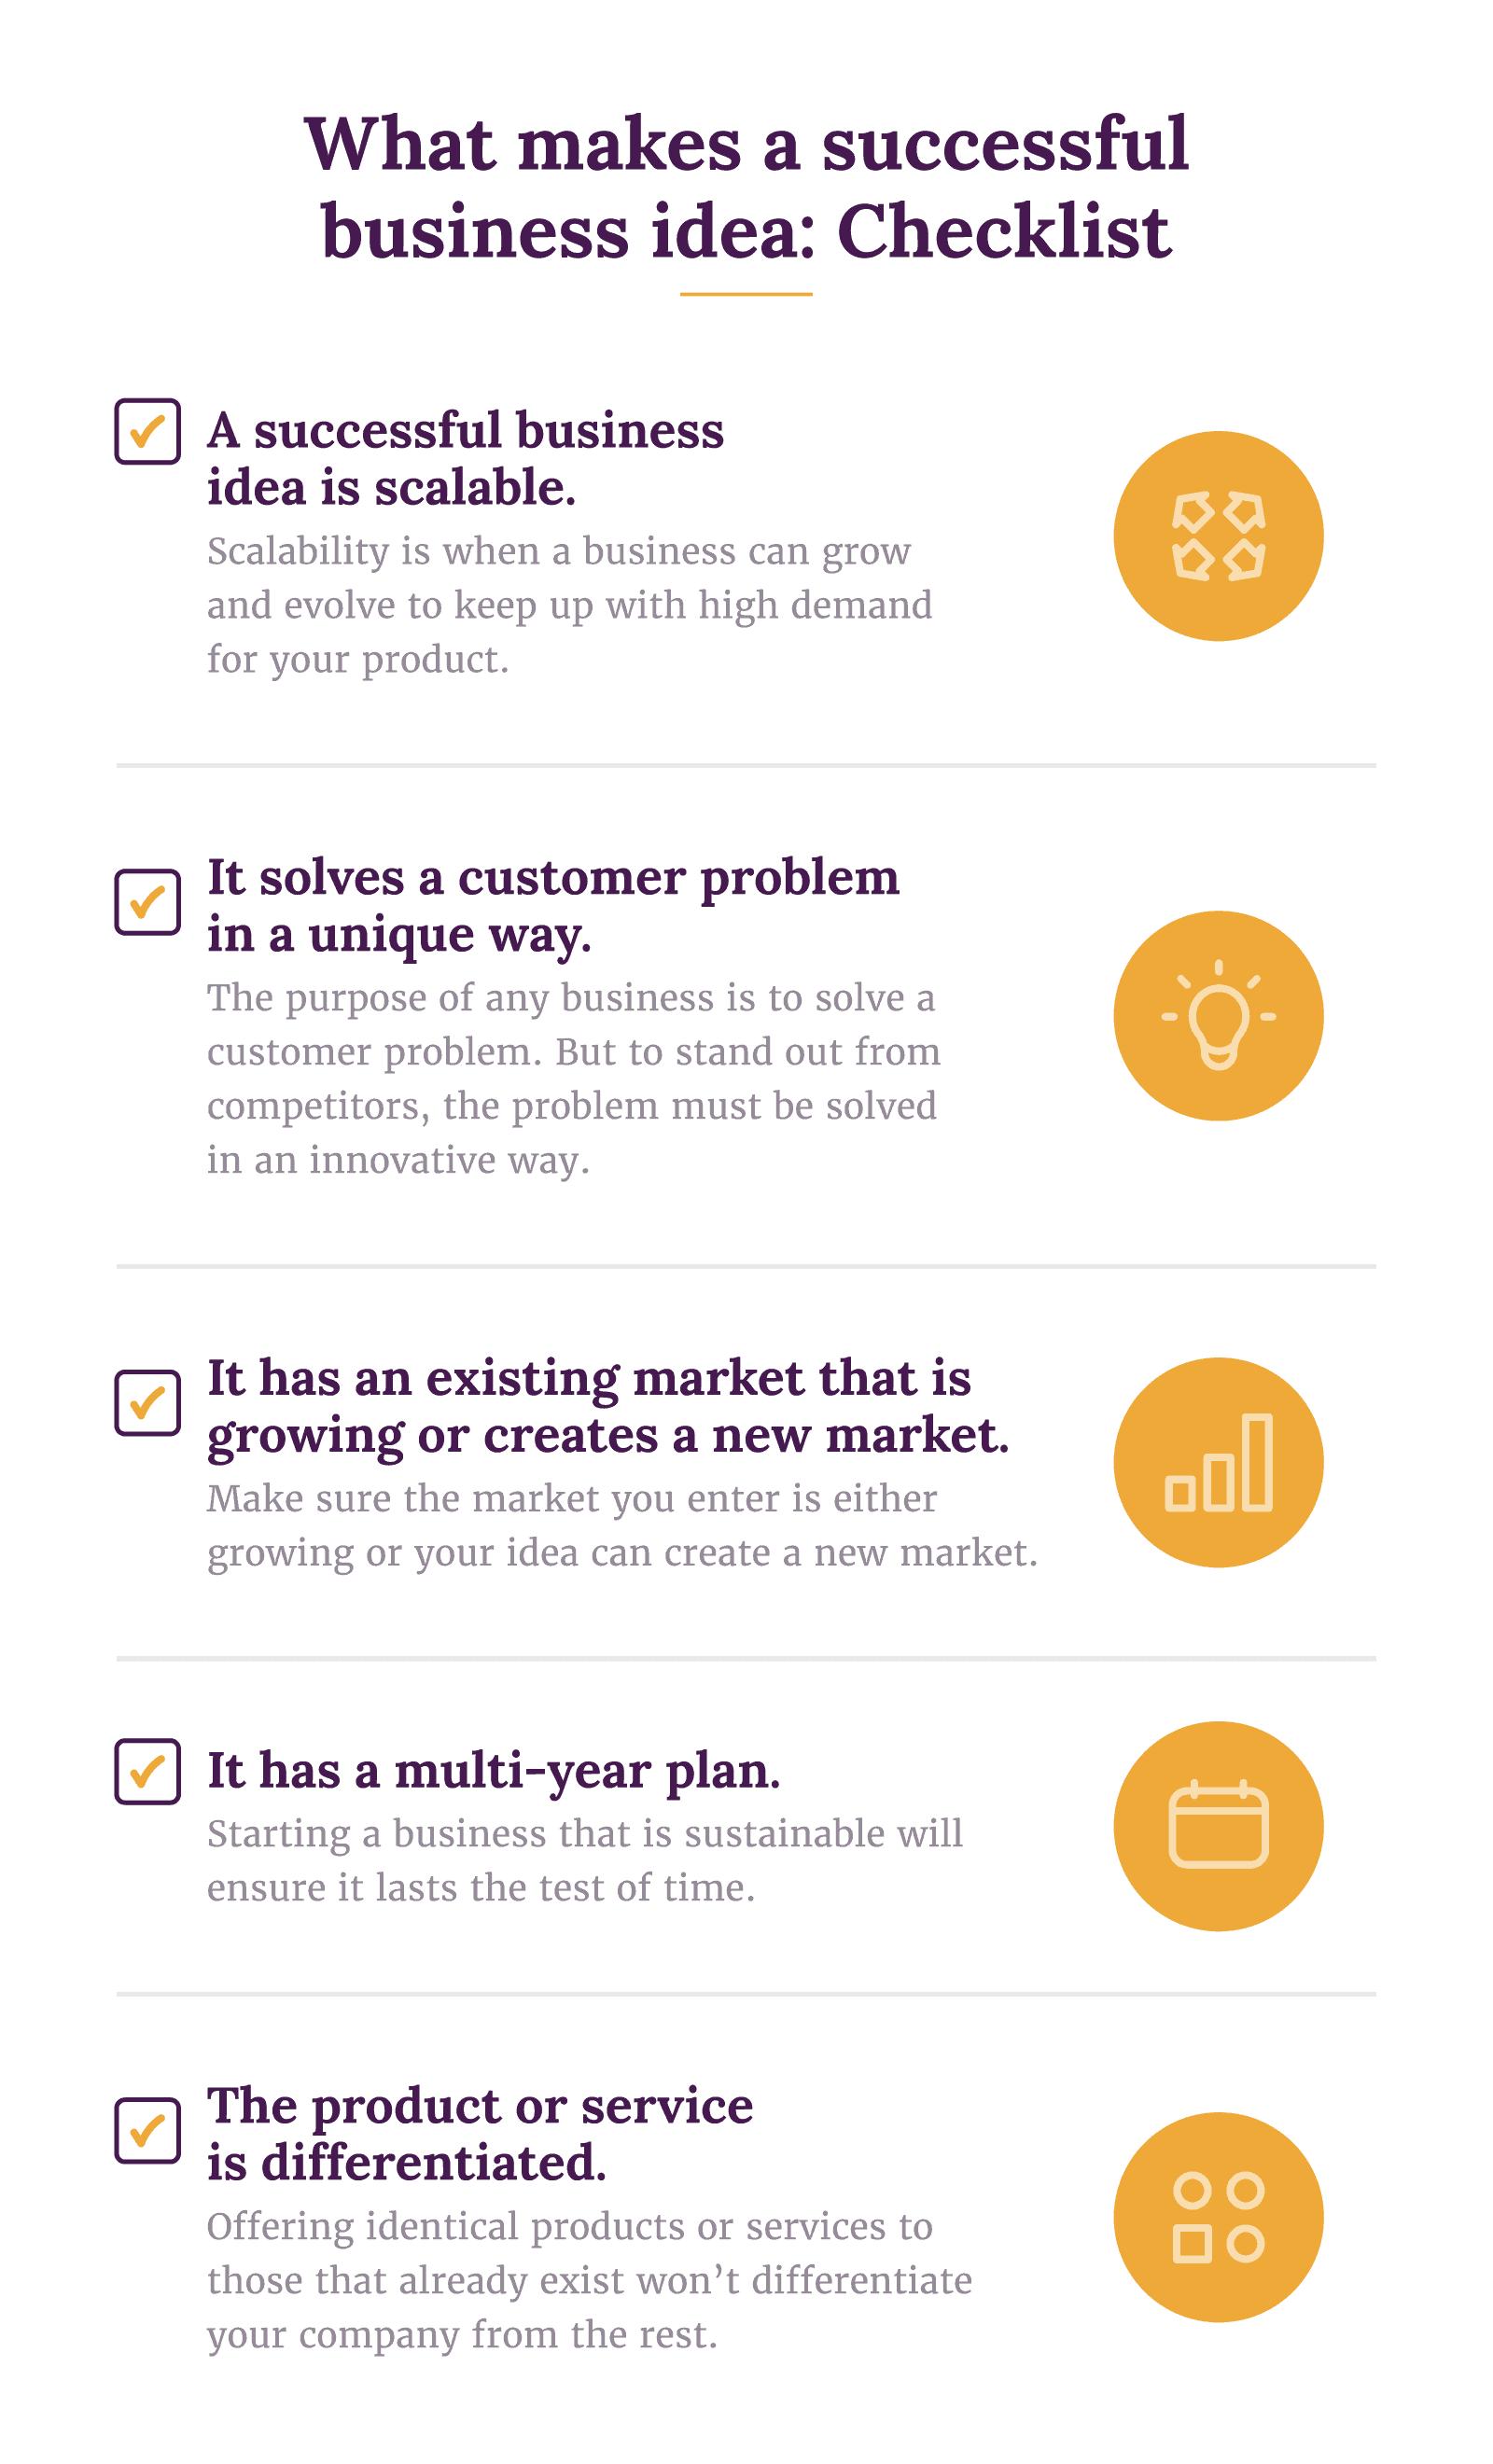 What makes a successful business idea: checklist